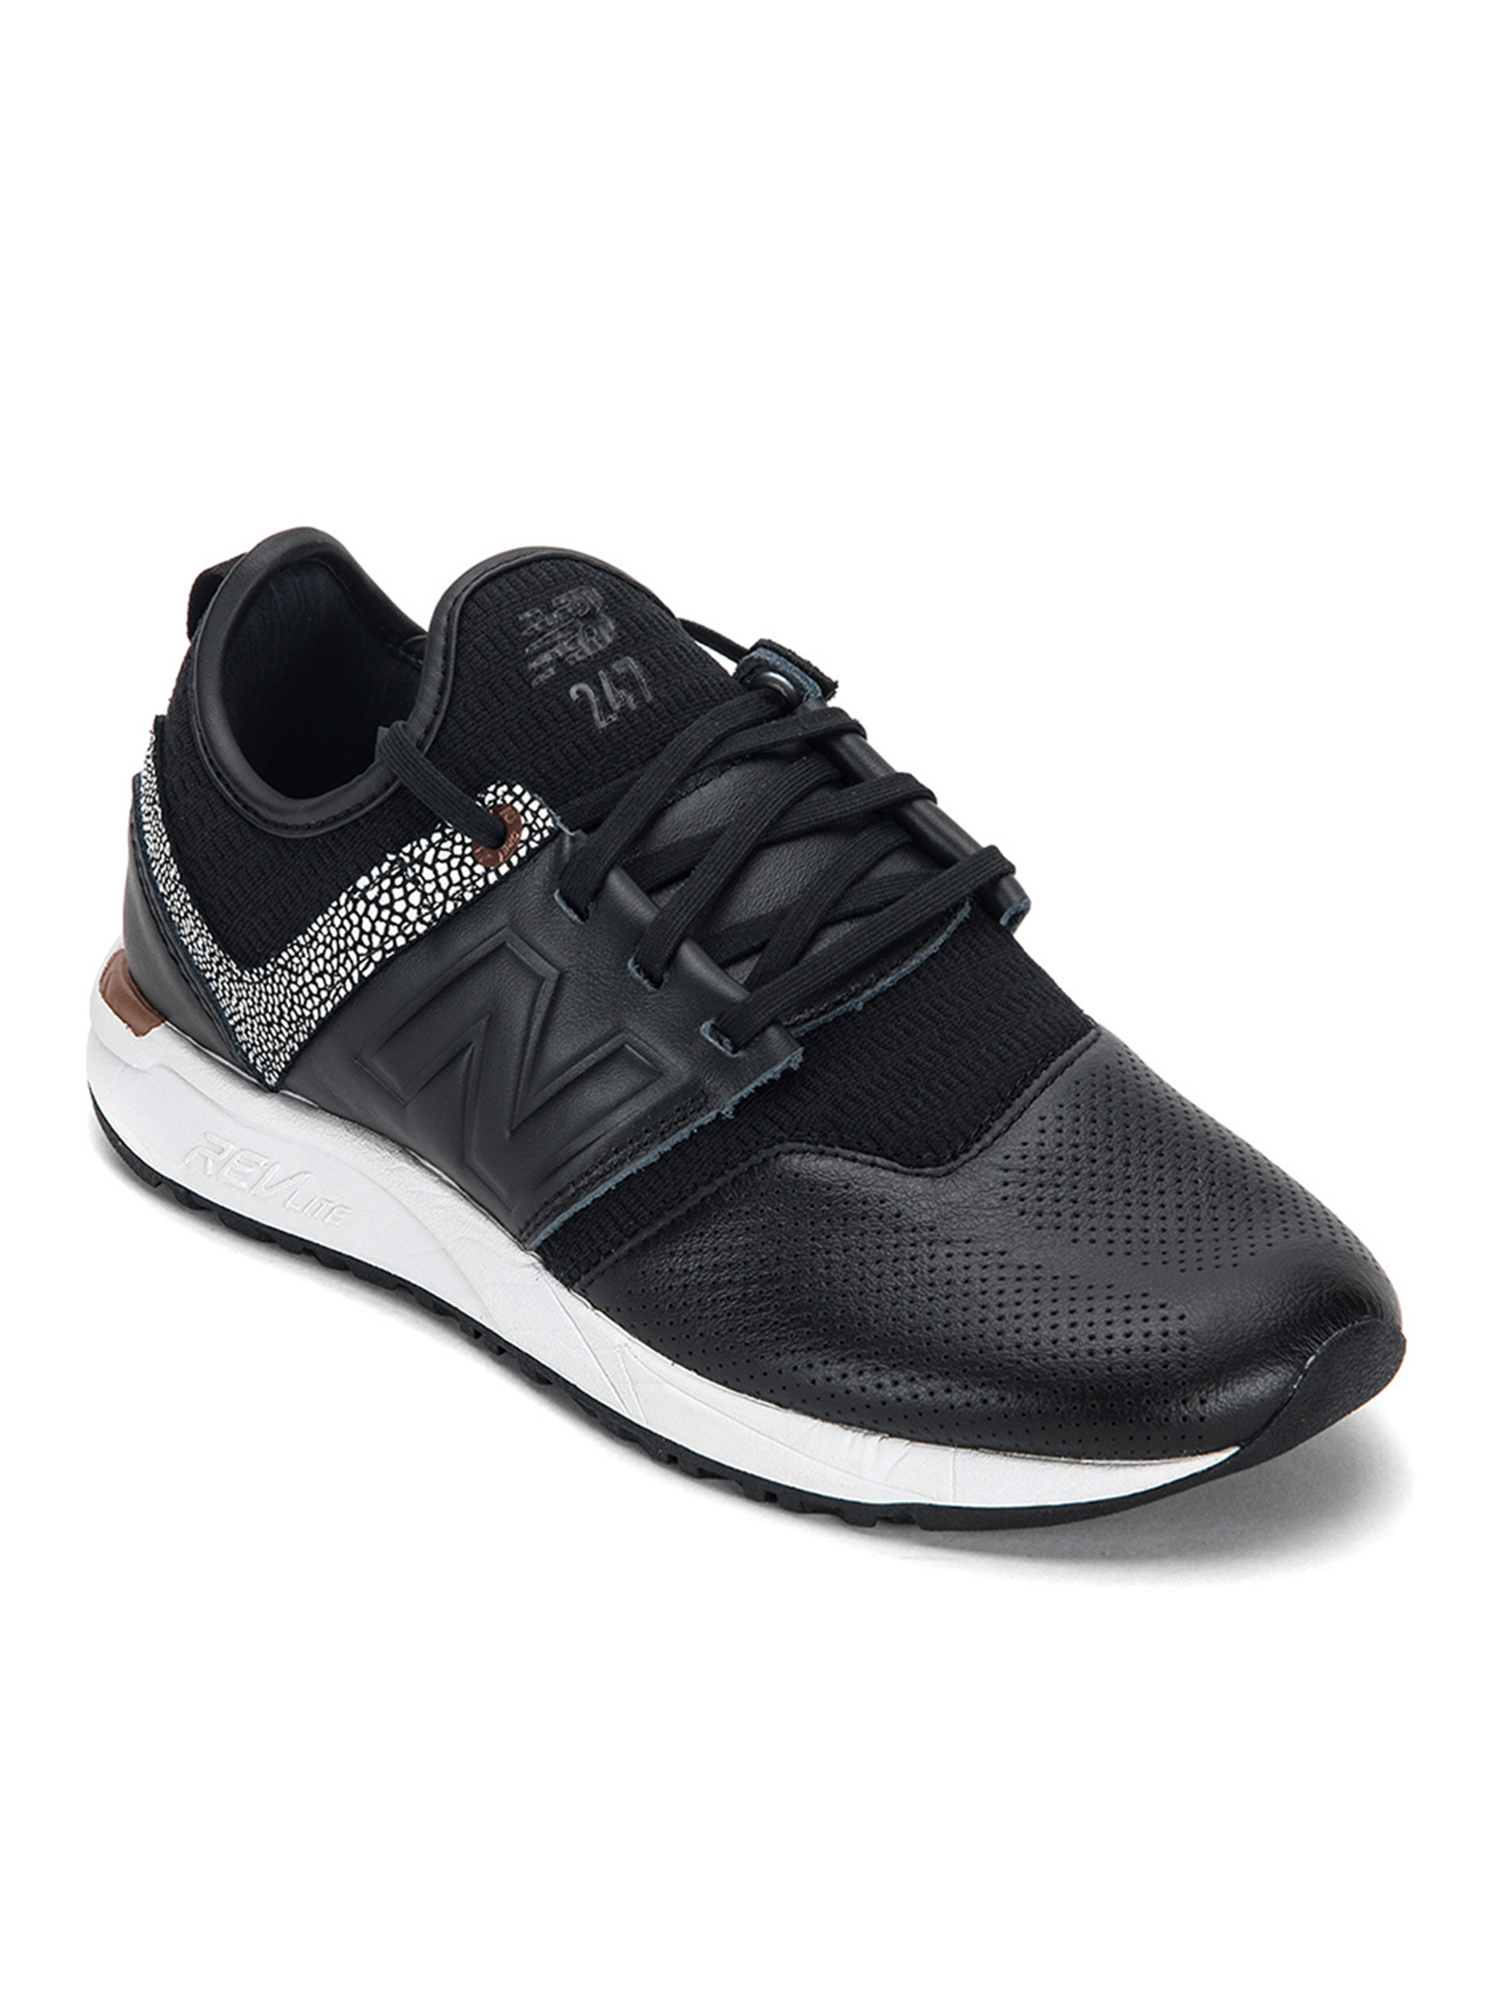 New Balance Women's 247 NB Grey Sneakers WRL247GY Black Copper Metallic by